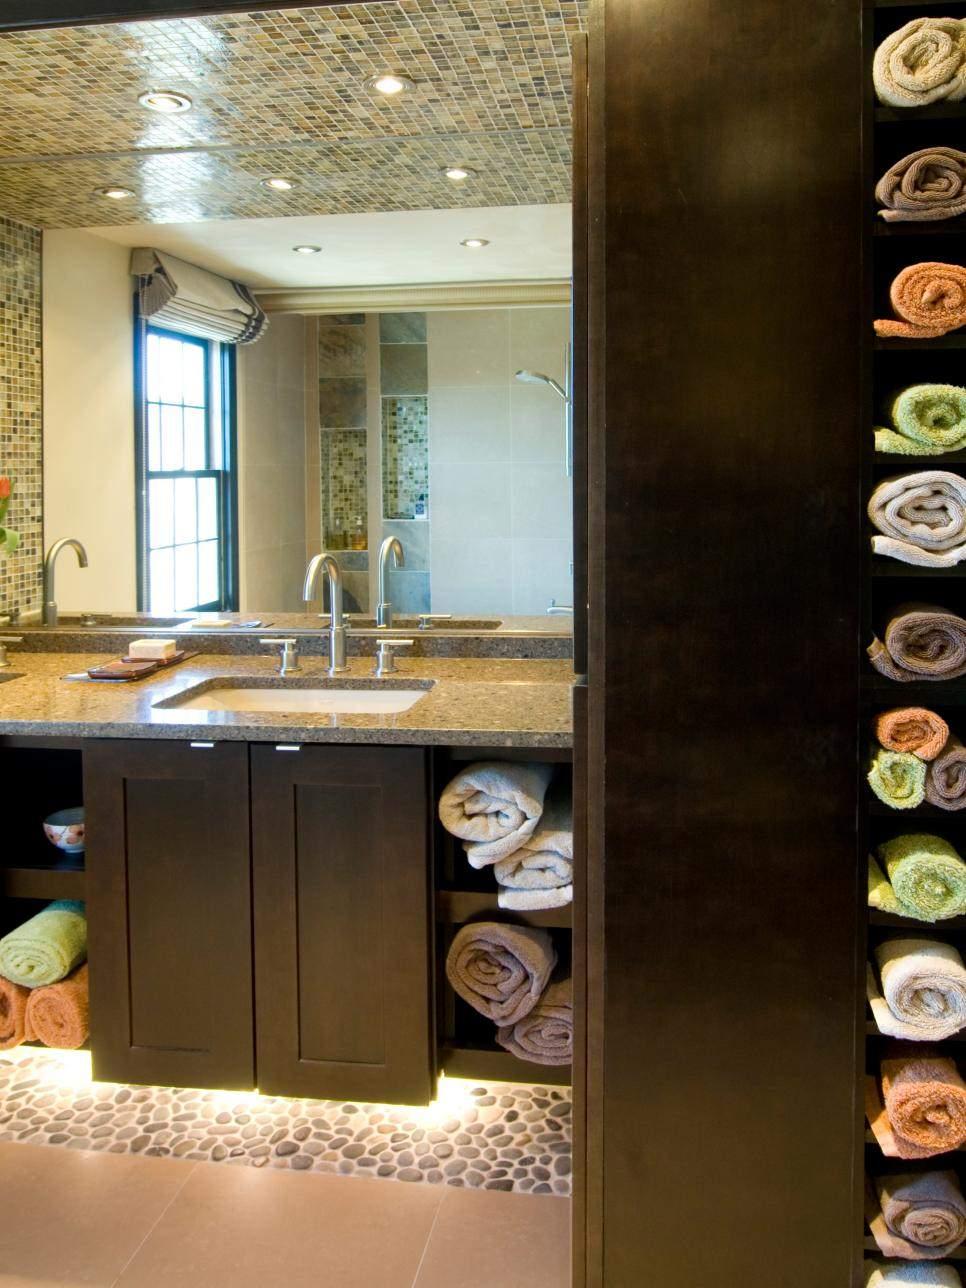 7 creative ideas for bathroom towel storage bathroom towel